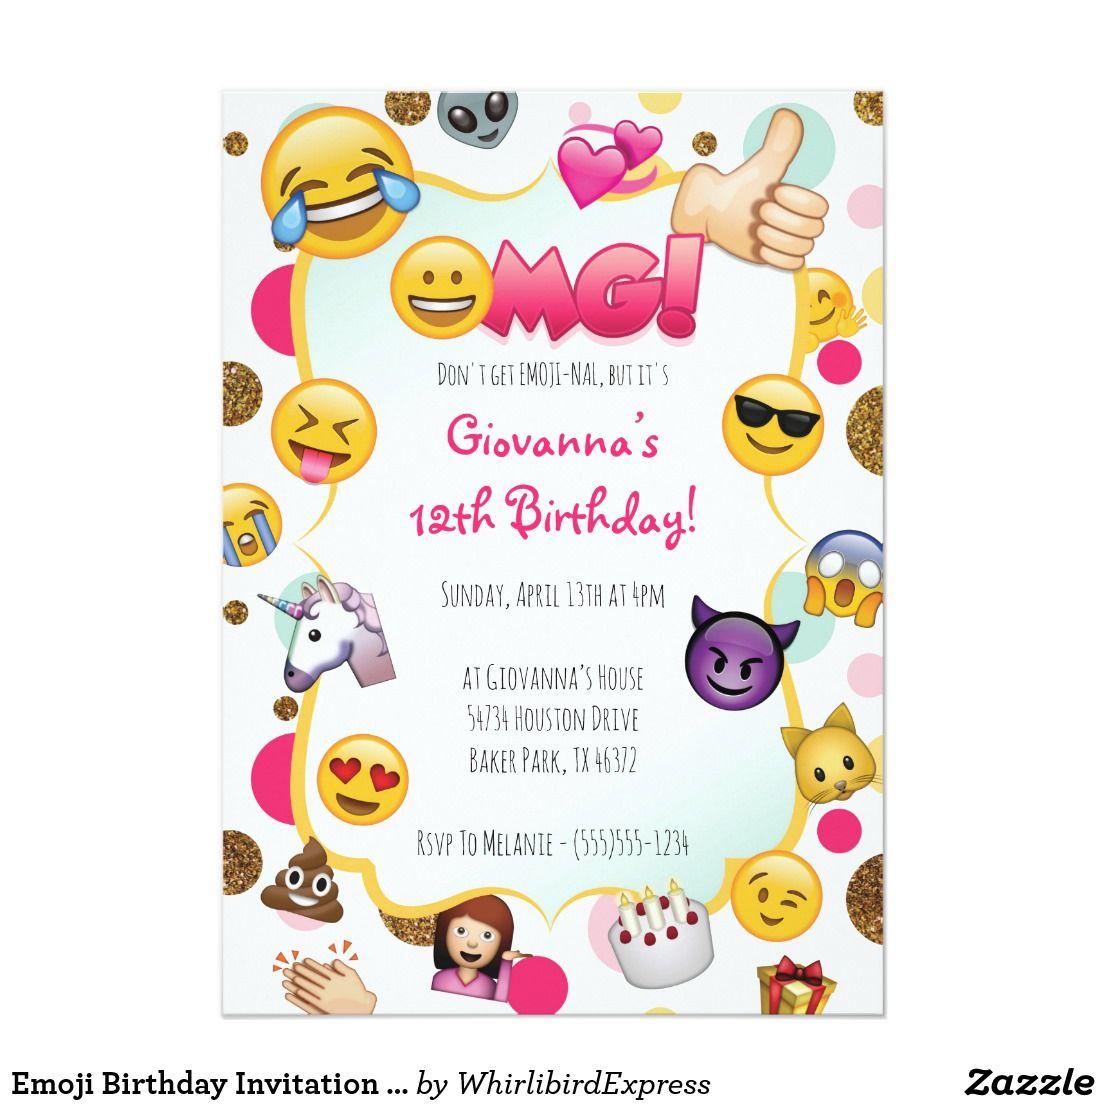 Serene Emoji Birthday Invitation Emoji Med Invites Emoji Birthday Invitation Emoji Med Invites Med Emoji Birthday Invitations Australia Emoji Birthday Invitations Download invitations Emoji Birthday Invitations